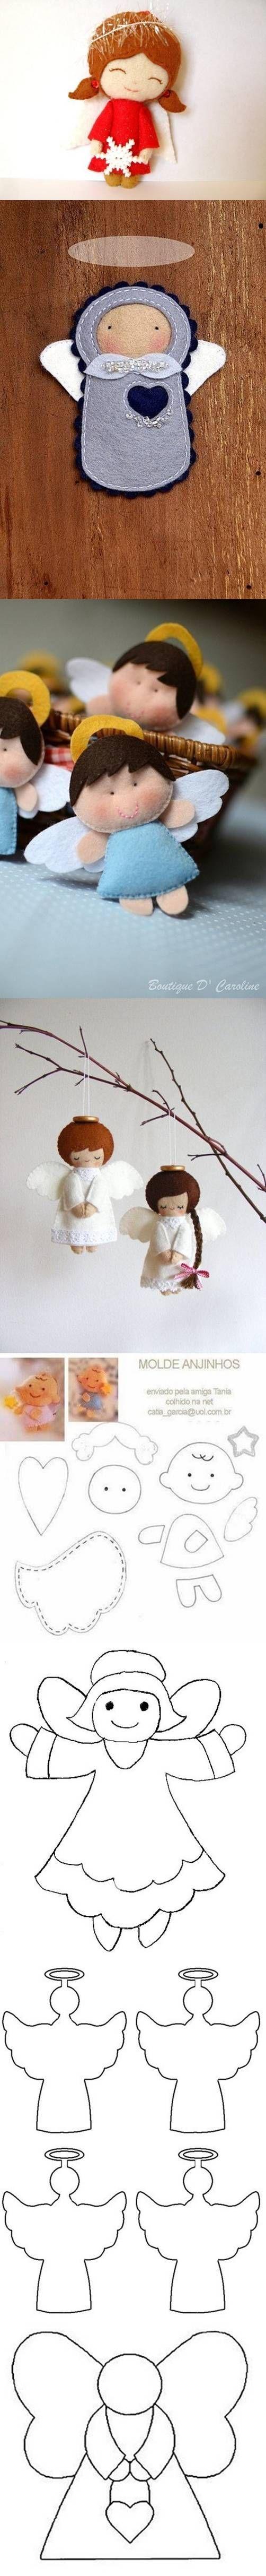 DIY Felt Angels Templates DIY Projects | UsefulDIY.com